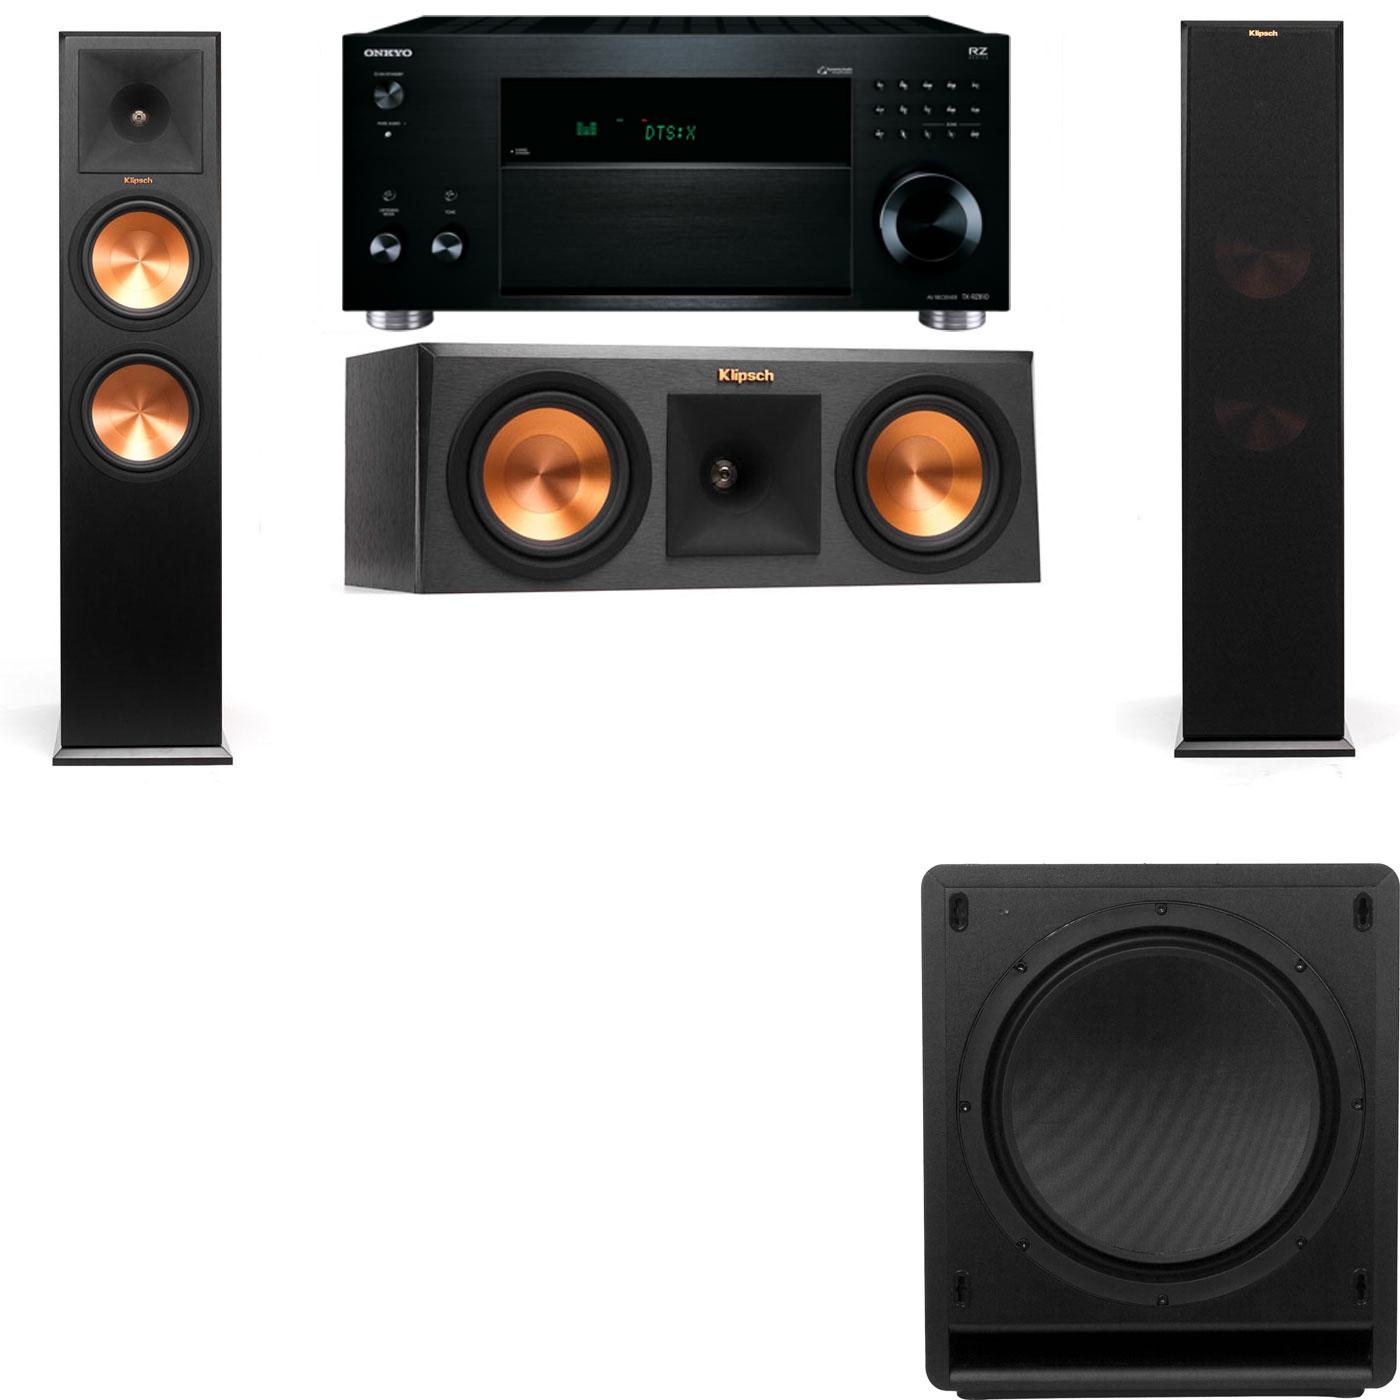 Klipsch RP-280F Tower Speakers-RP-250C-SW-112-3.1-Onkyo TX-RZ810